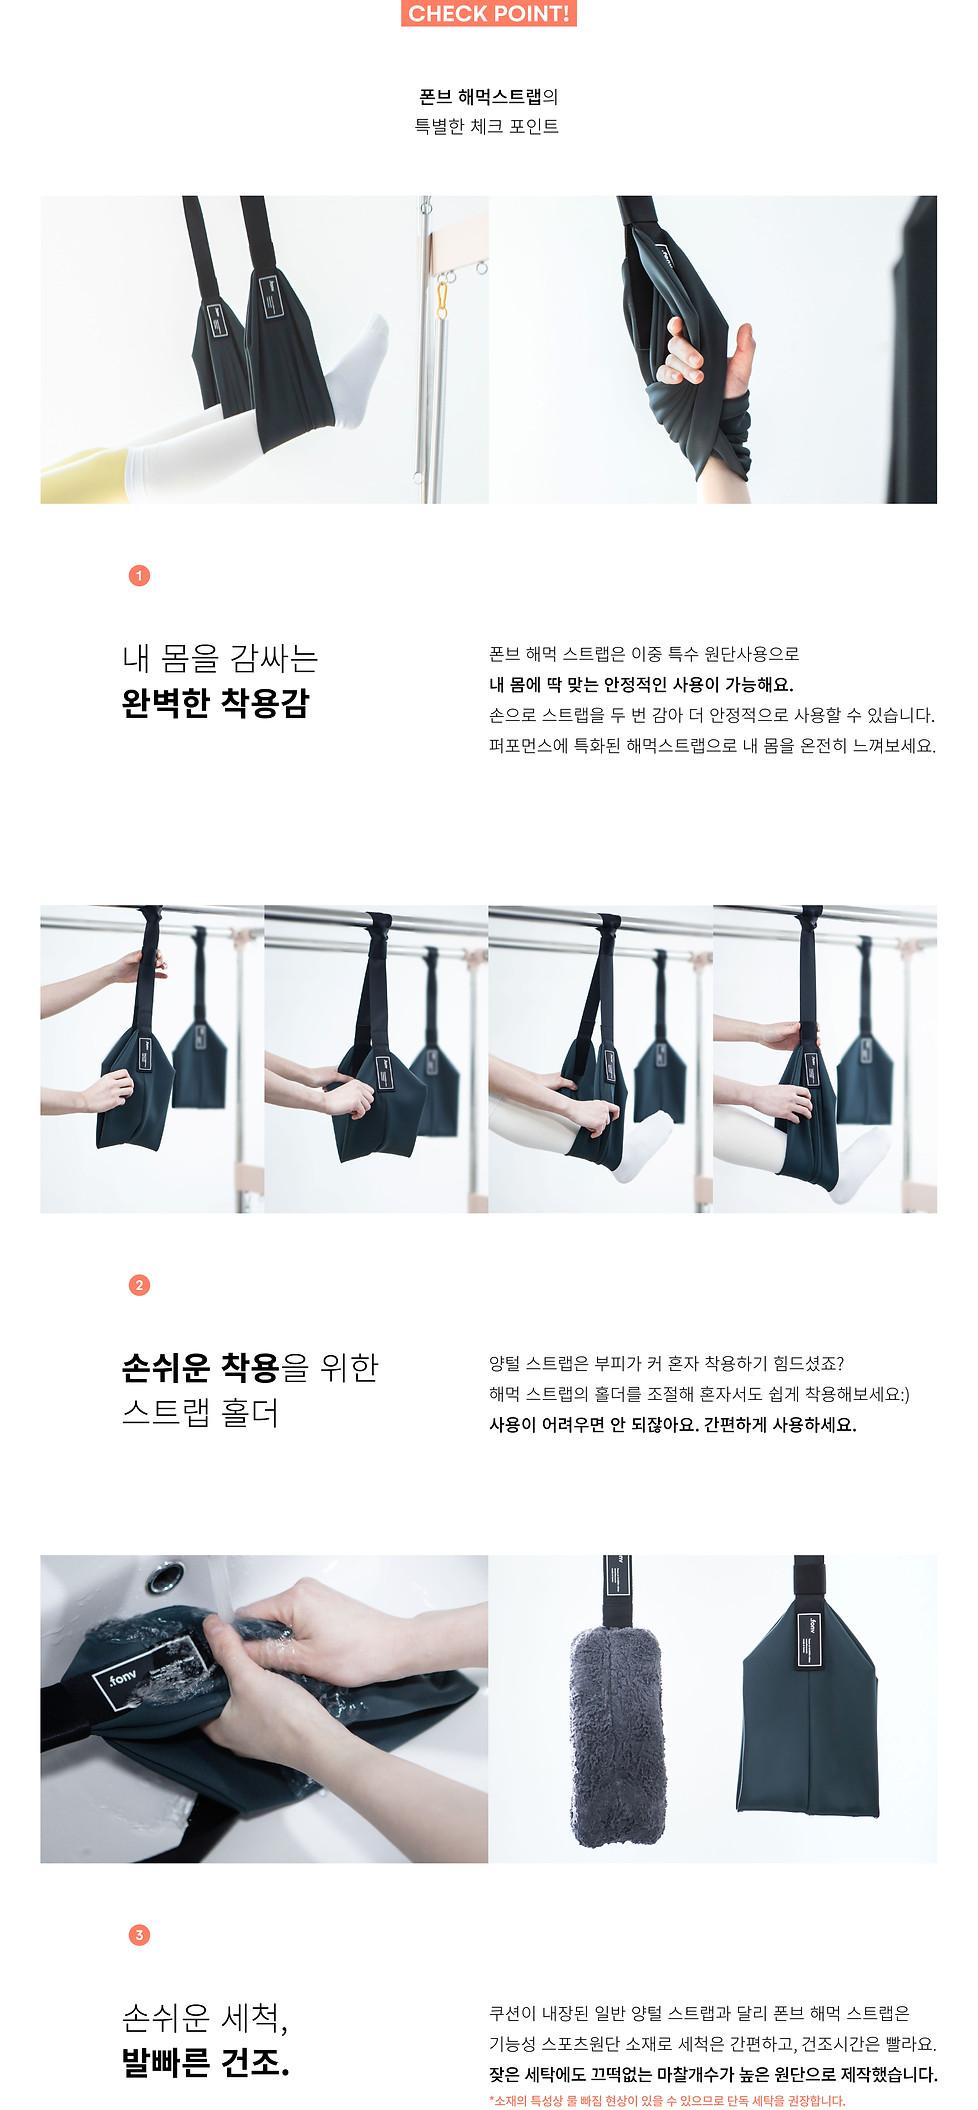 210223_hammock strap_대지 1 사본 6.jpg